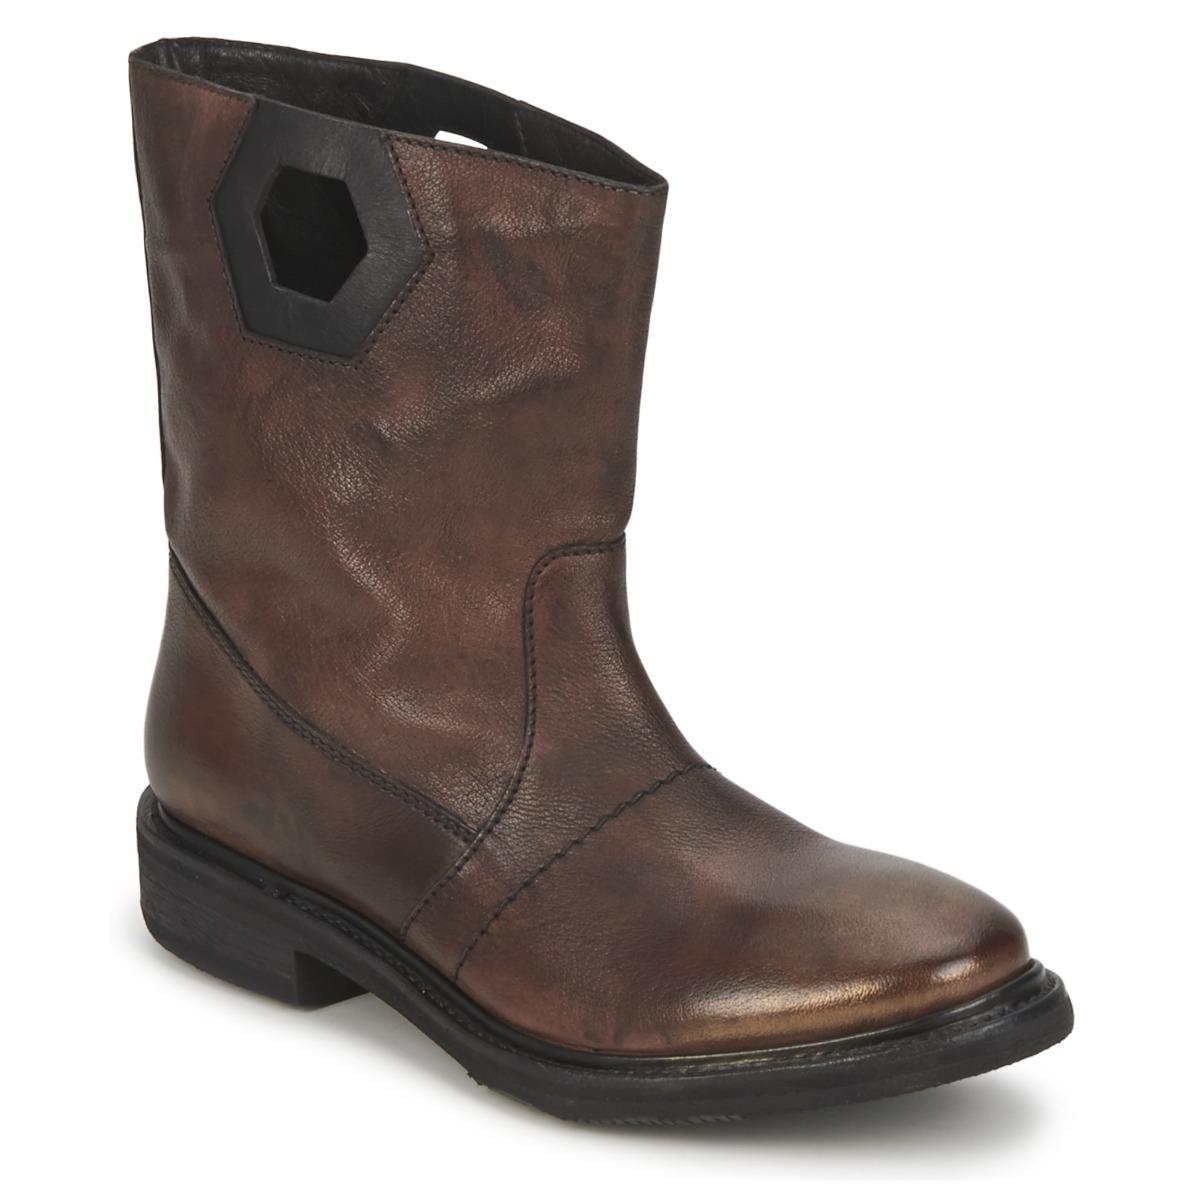 Bikkembergs TEXANINO 12 Braun - Kostenloser Versand bei Spartoode ! - Schuhe Boots Damen 119,50 €